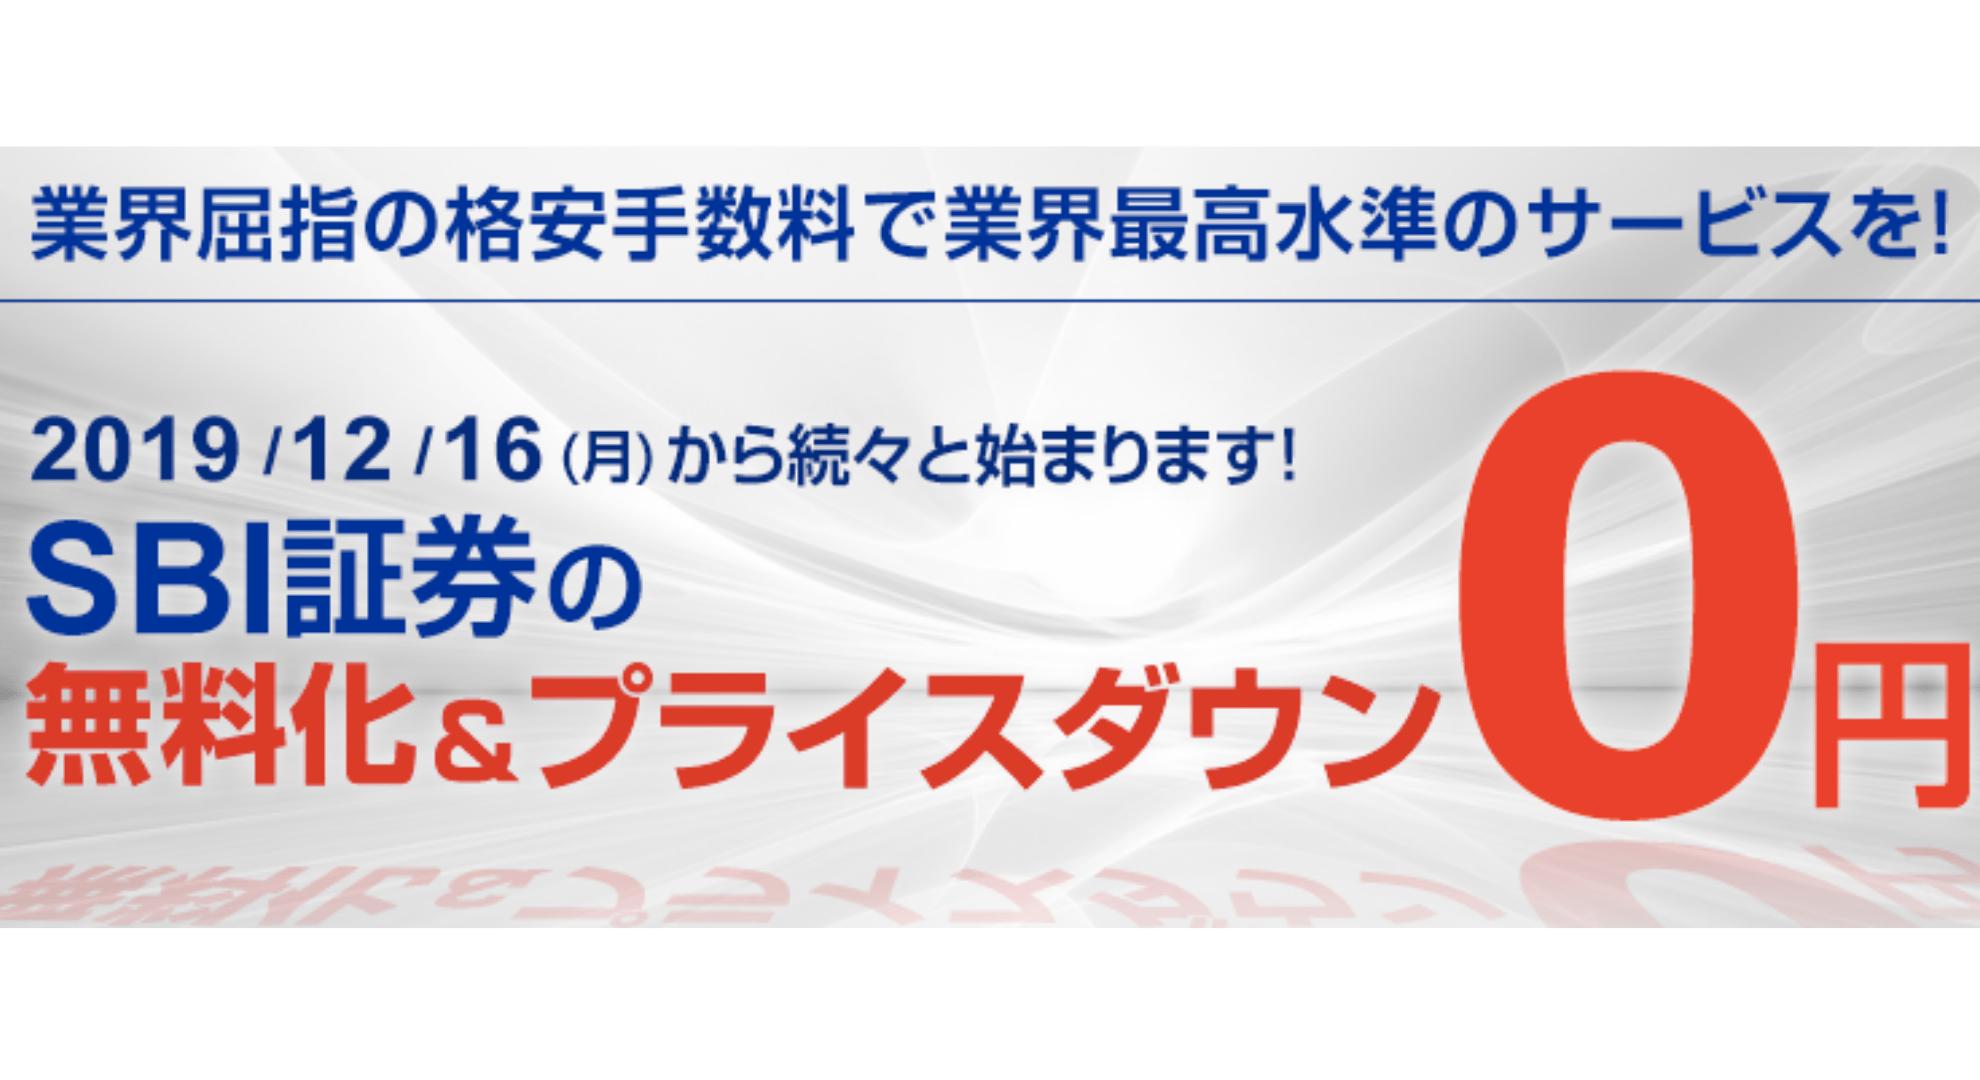 【SBI証券】SBI証券が株式の取引手数料の無料サービスを拡大!!